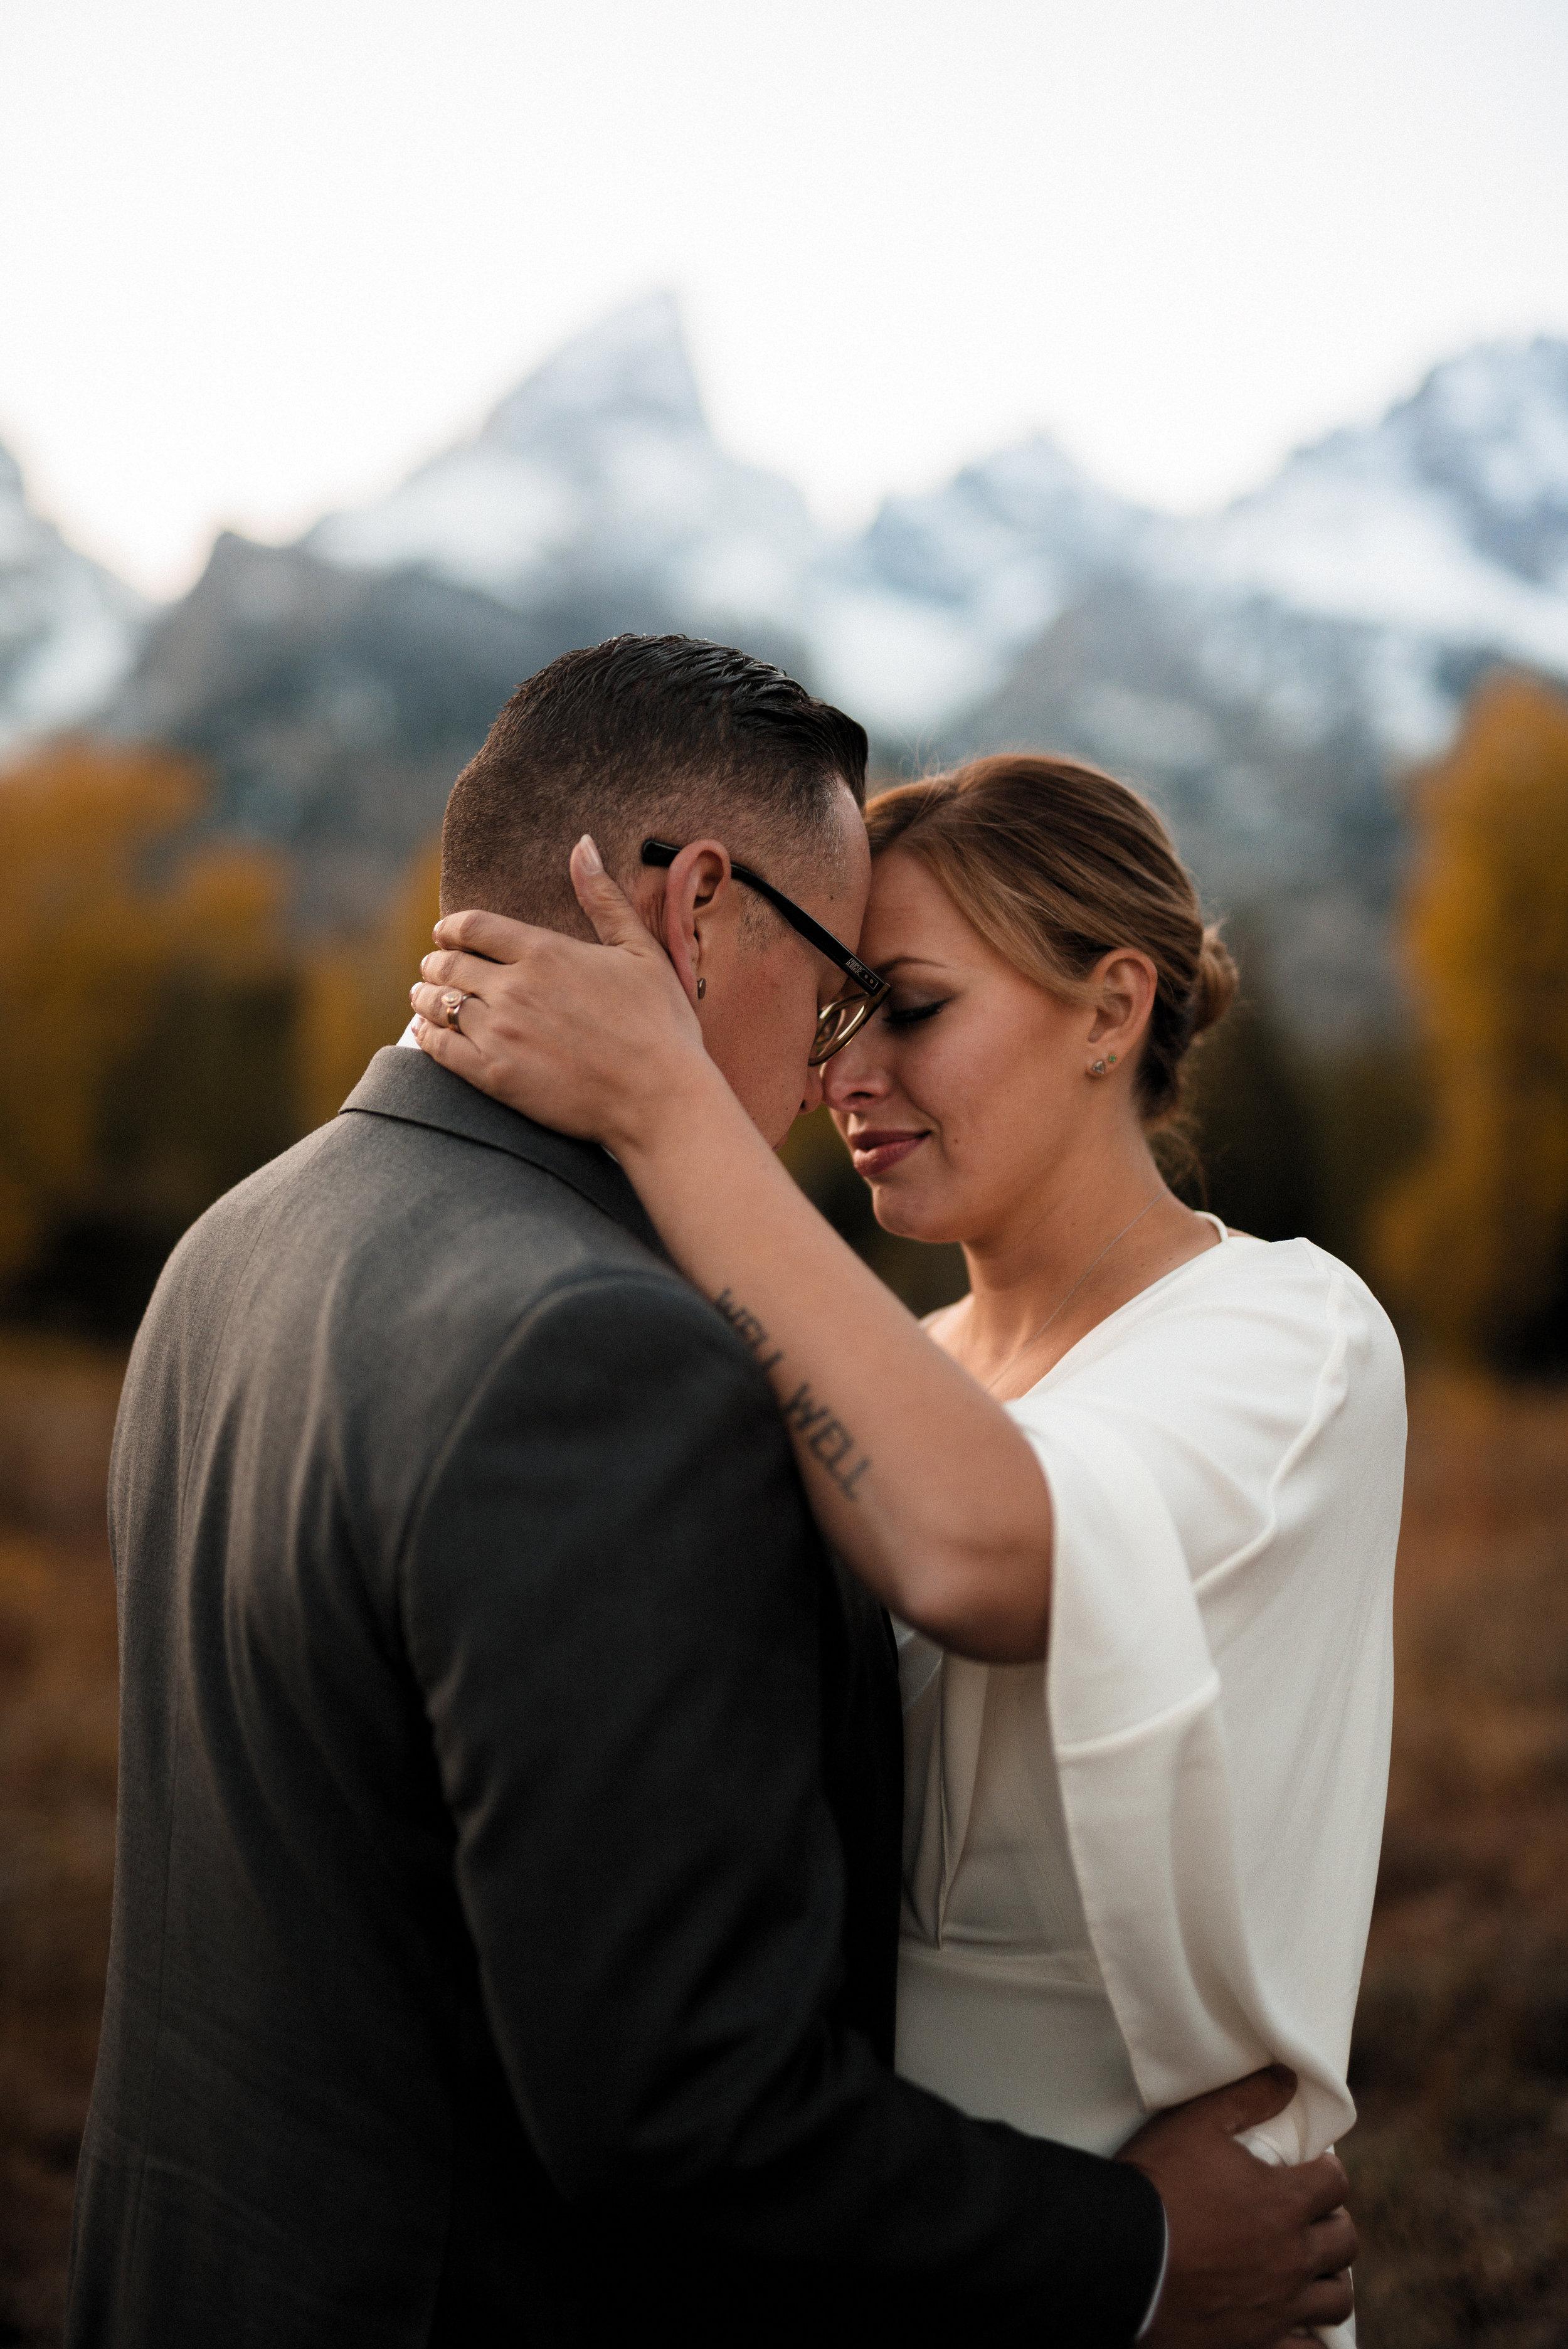 Jackson Wyoming dating